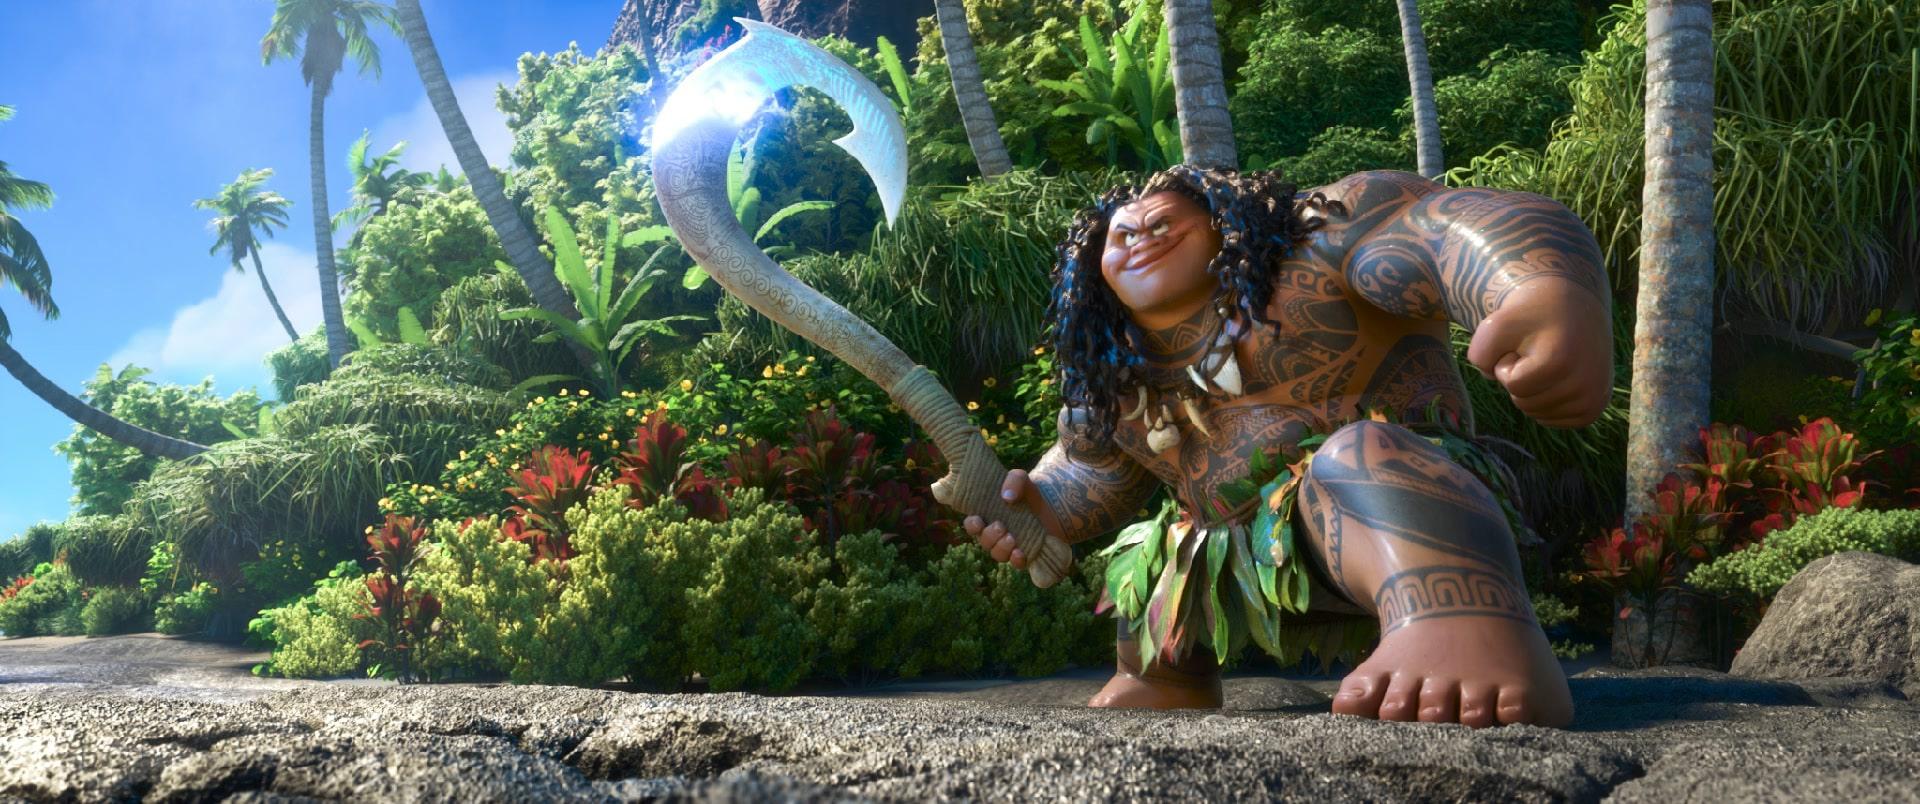 Disney's Moana in theaters November 23 | ThisNThatwithOlivia.com #Moana